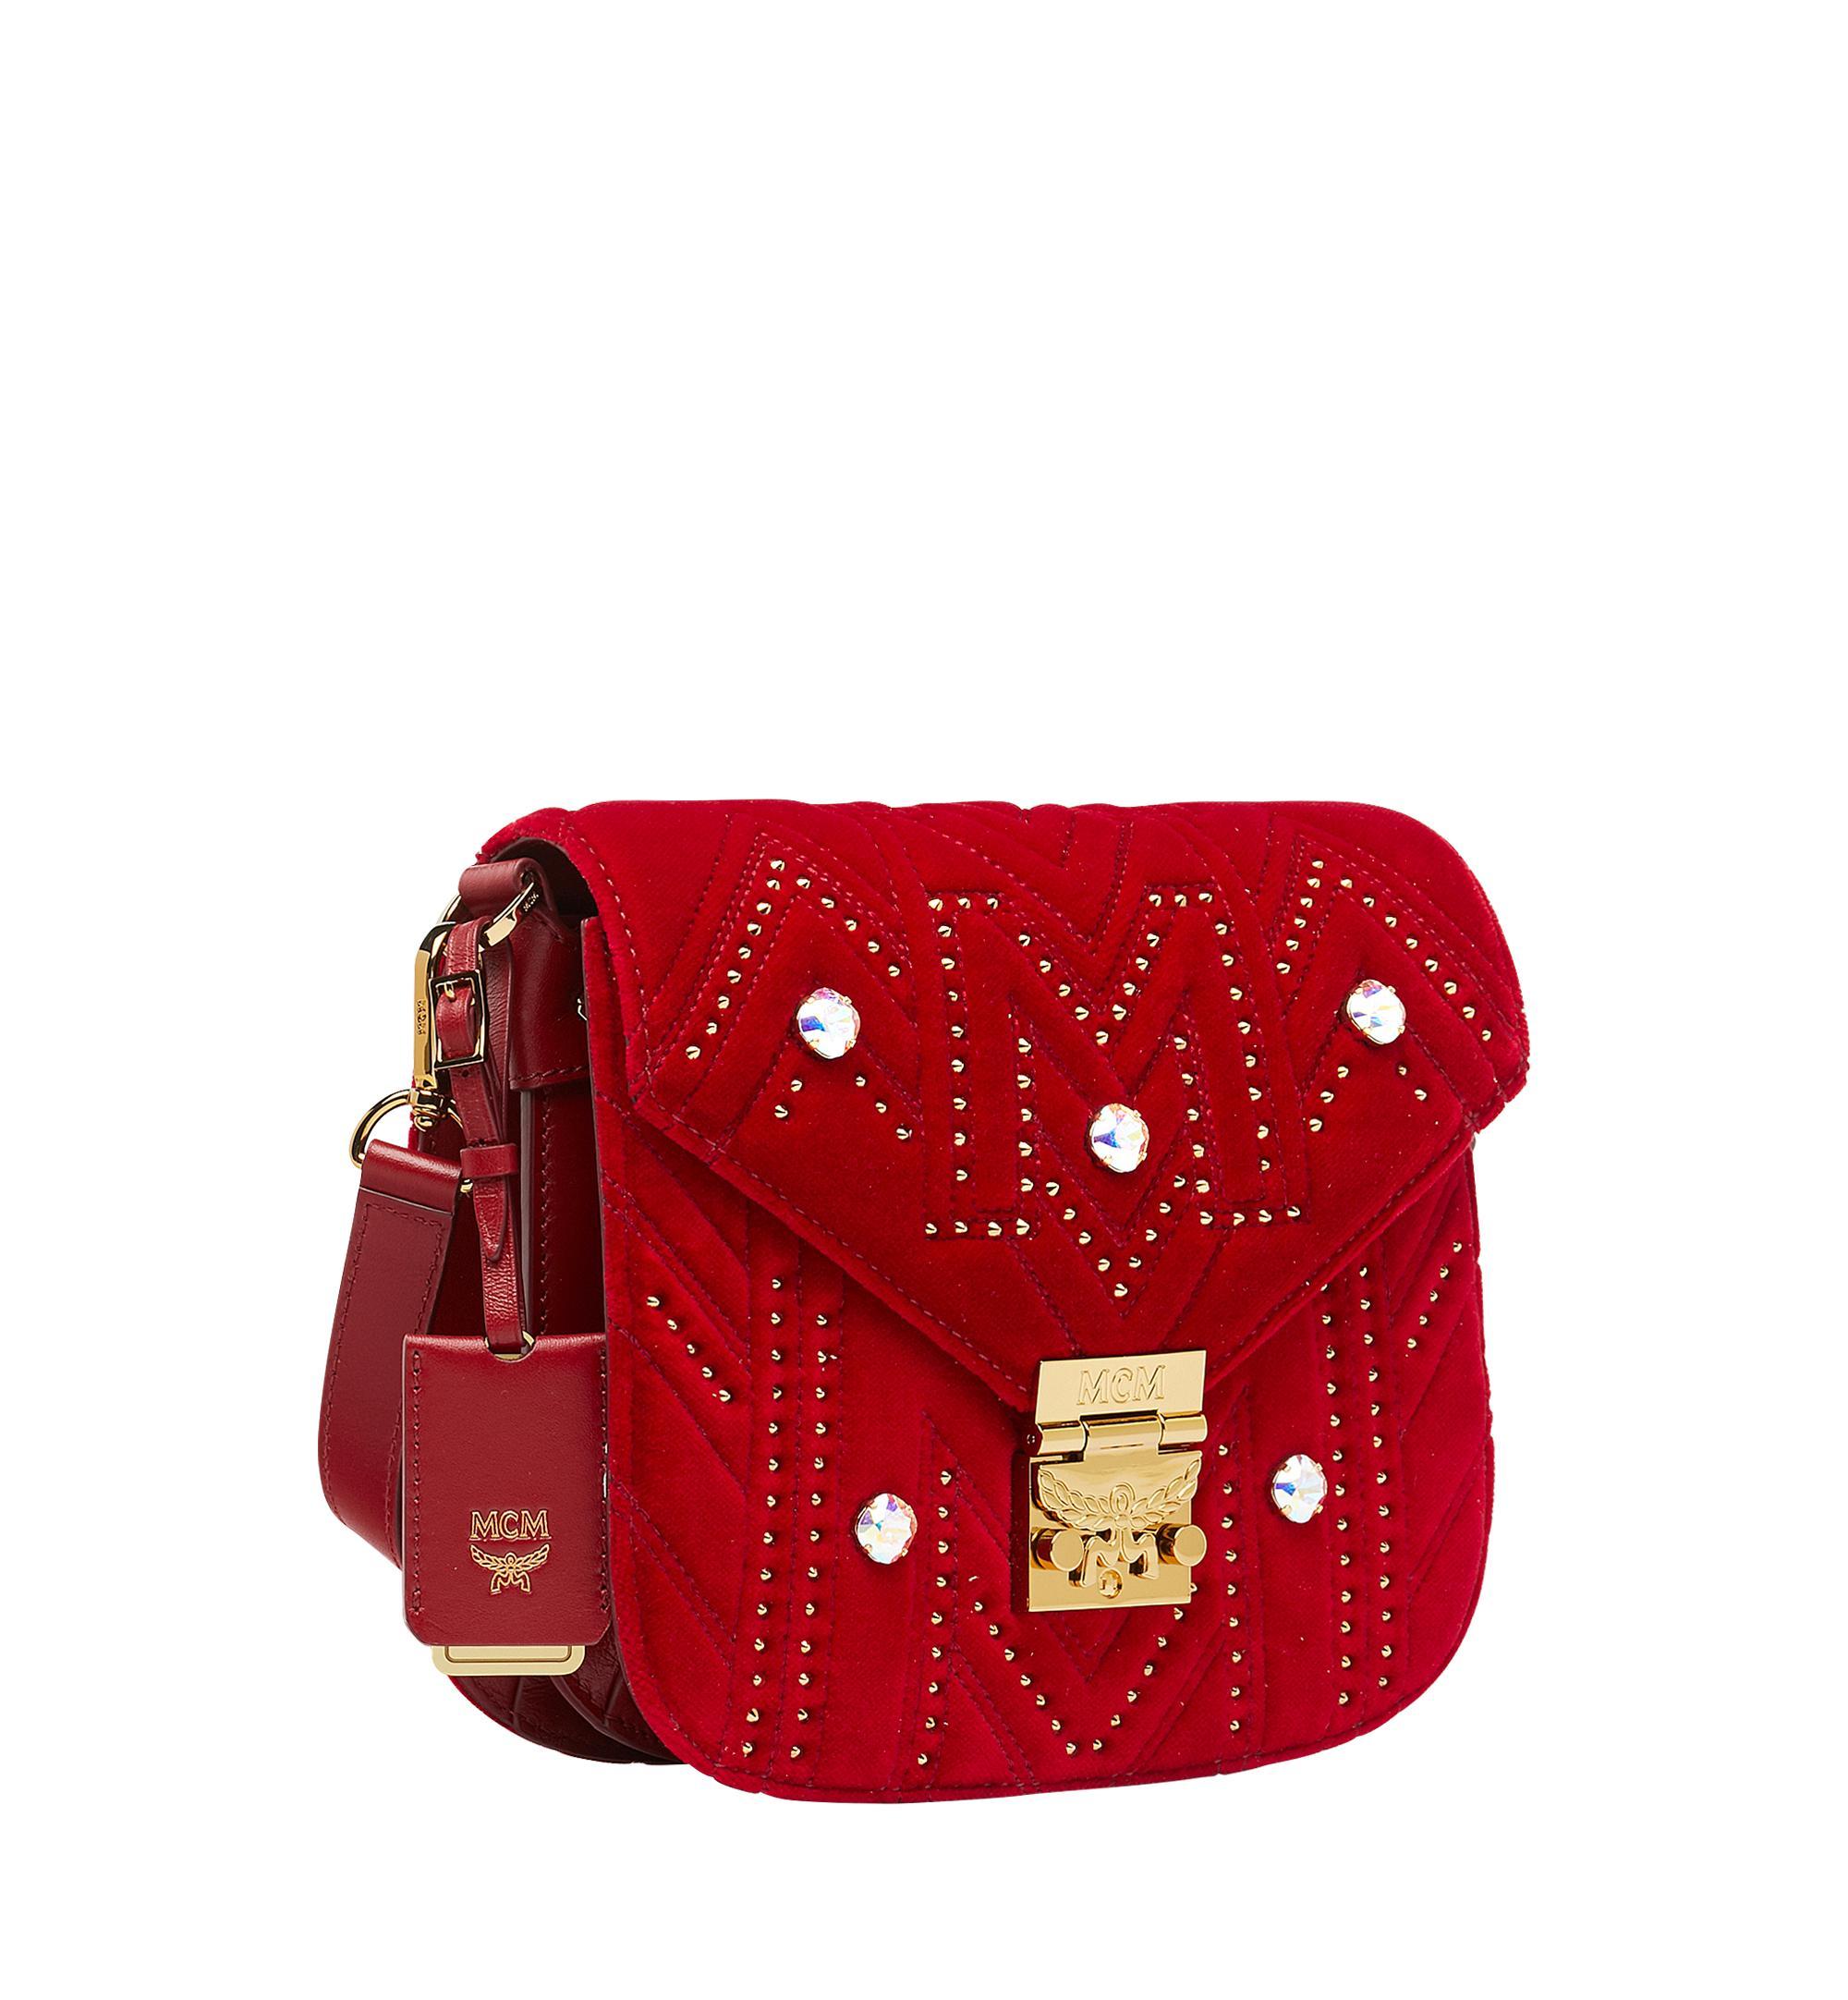 857251120f MCM Patricia Shoulder Bag In Velvet Crystal Studs in Red - Lyst